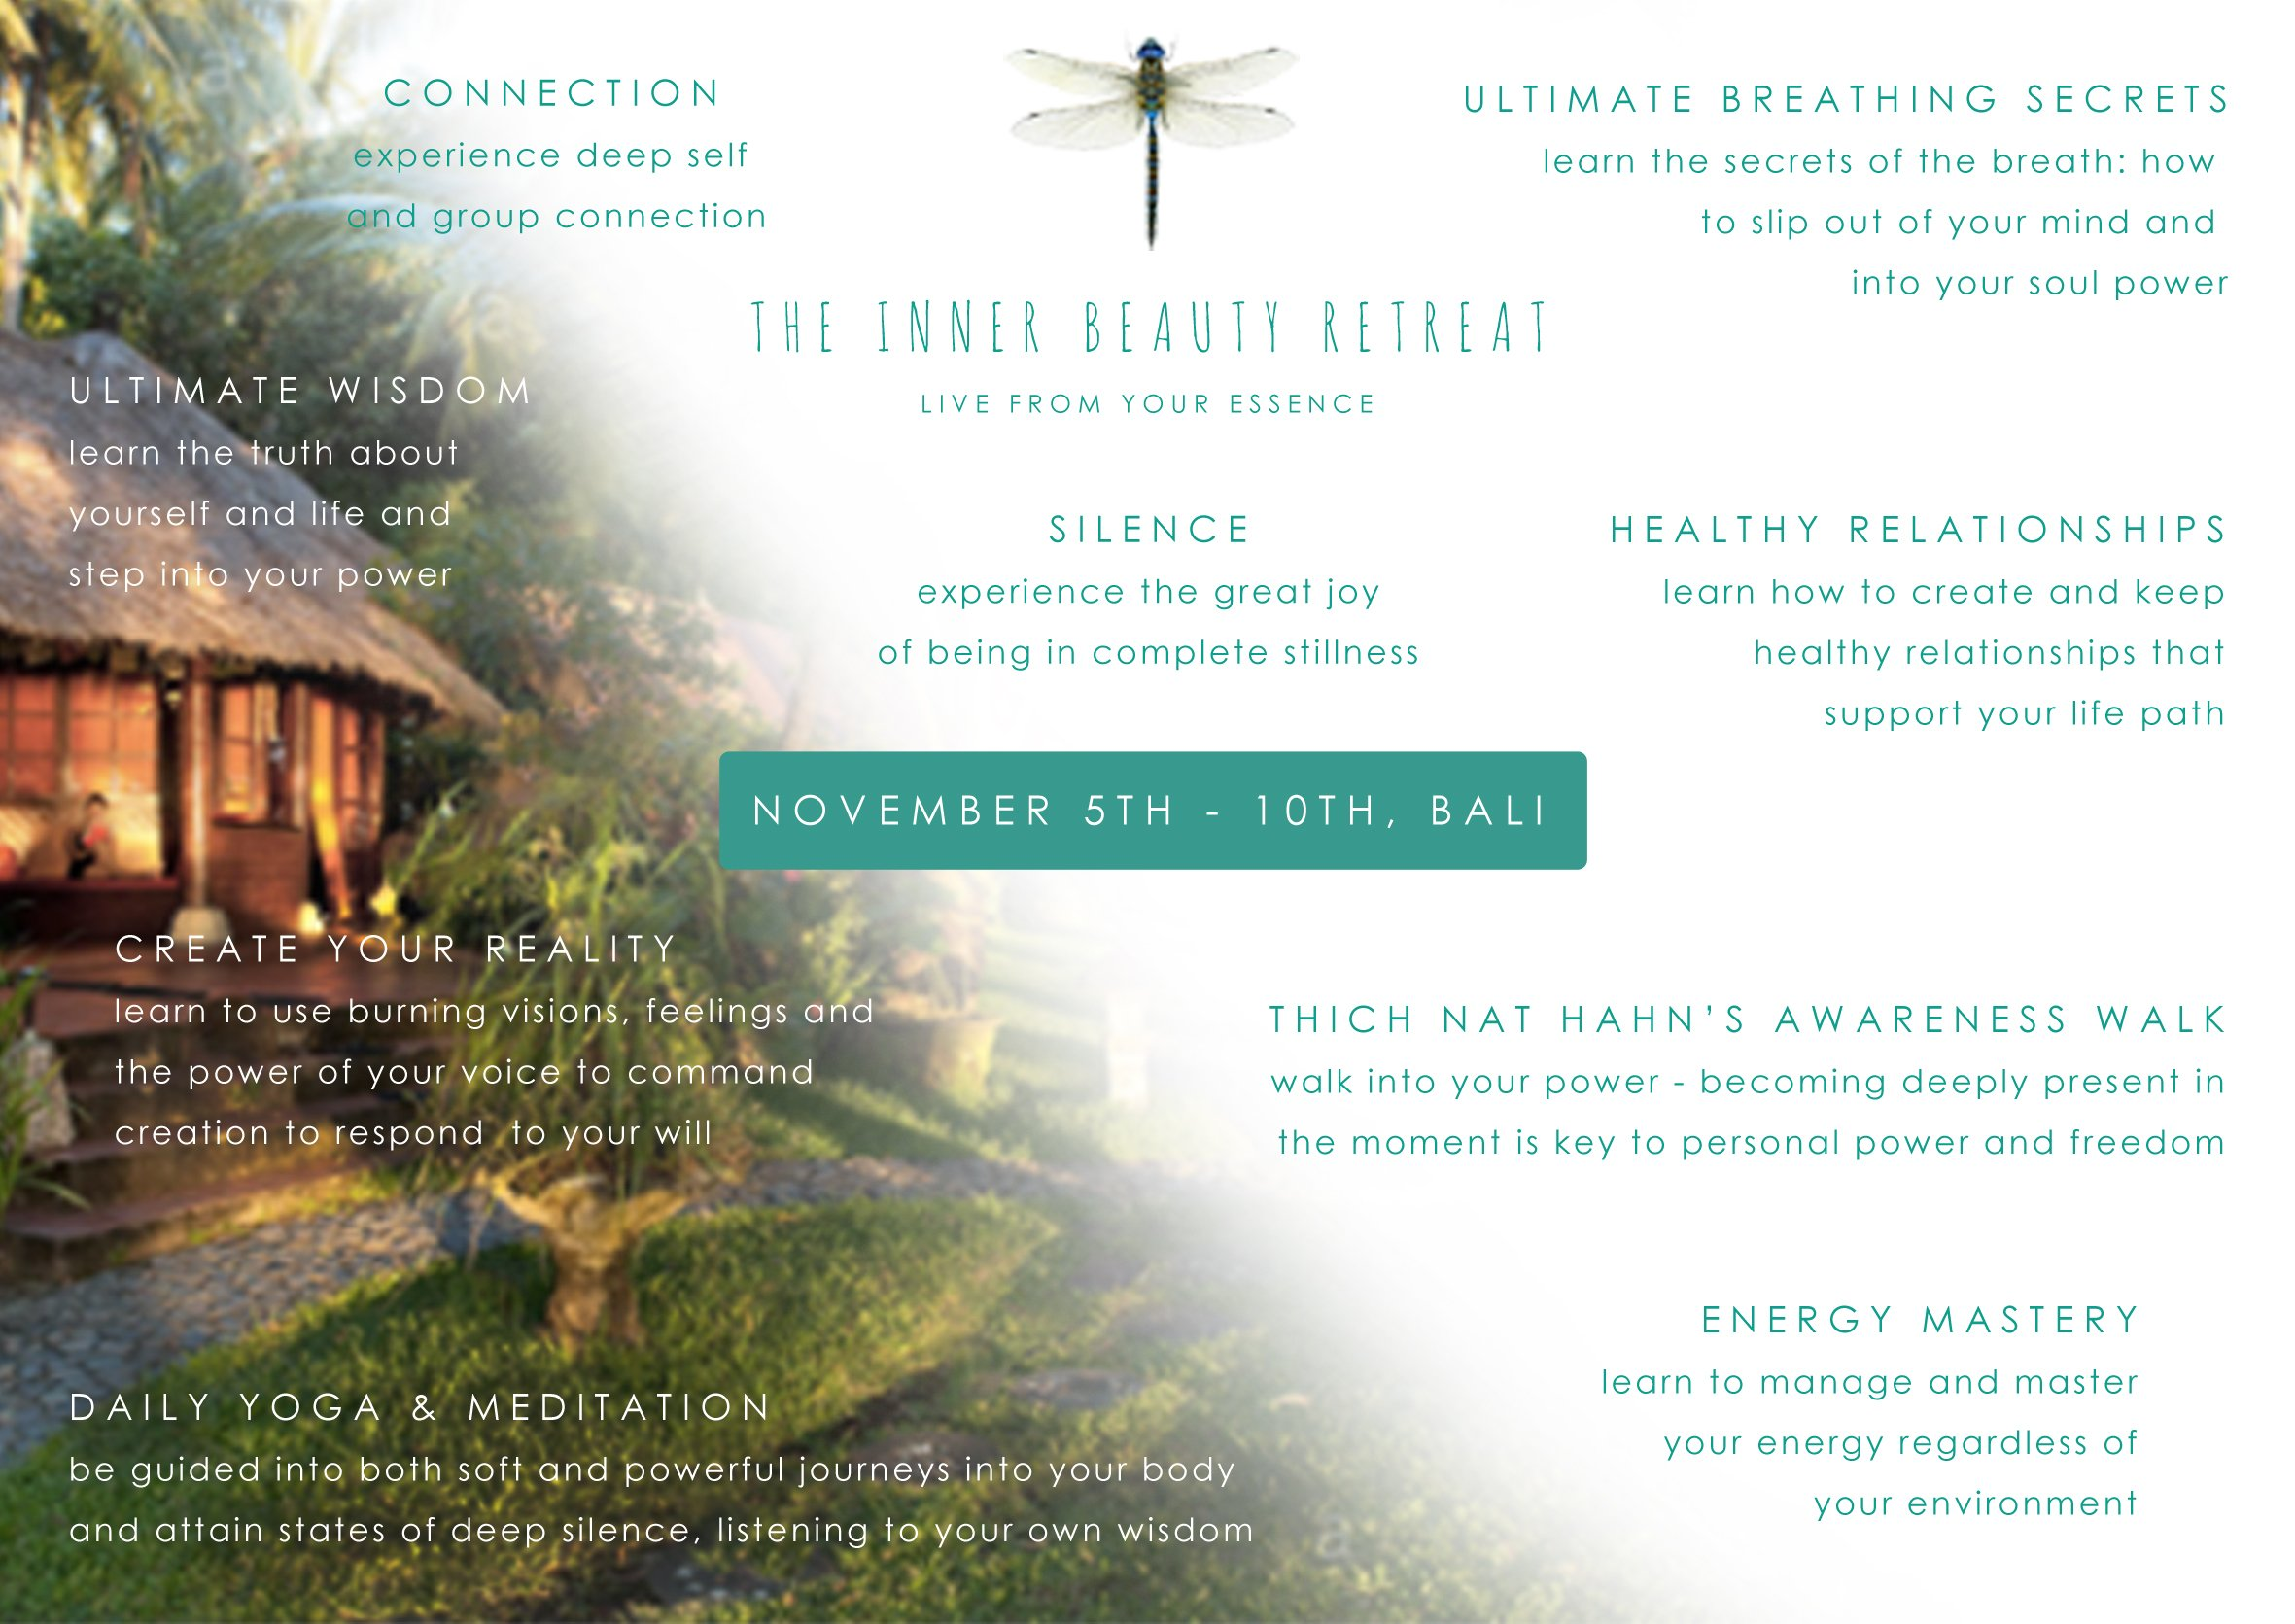 Inner Beauty Retreat BALI Nov 5th - 10th